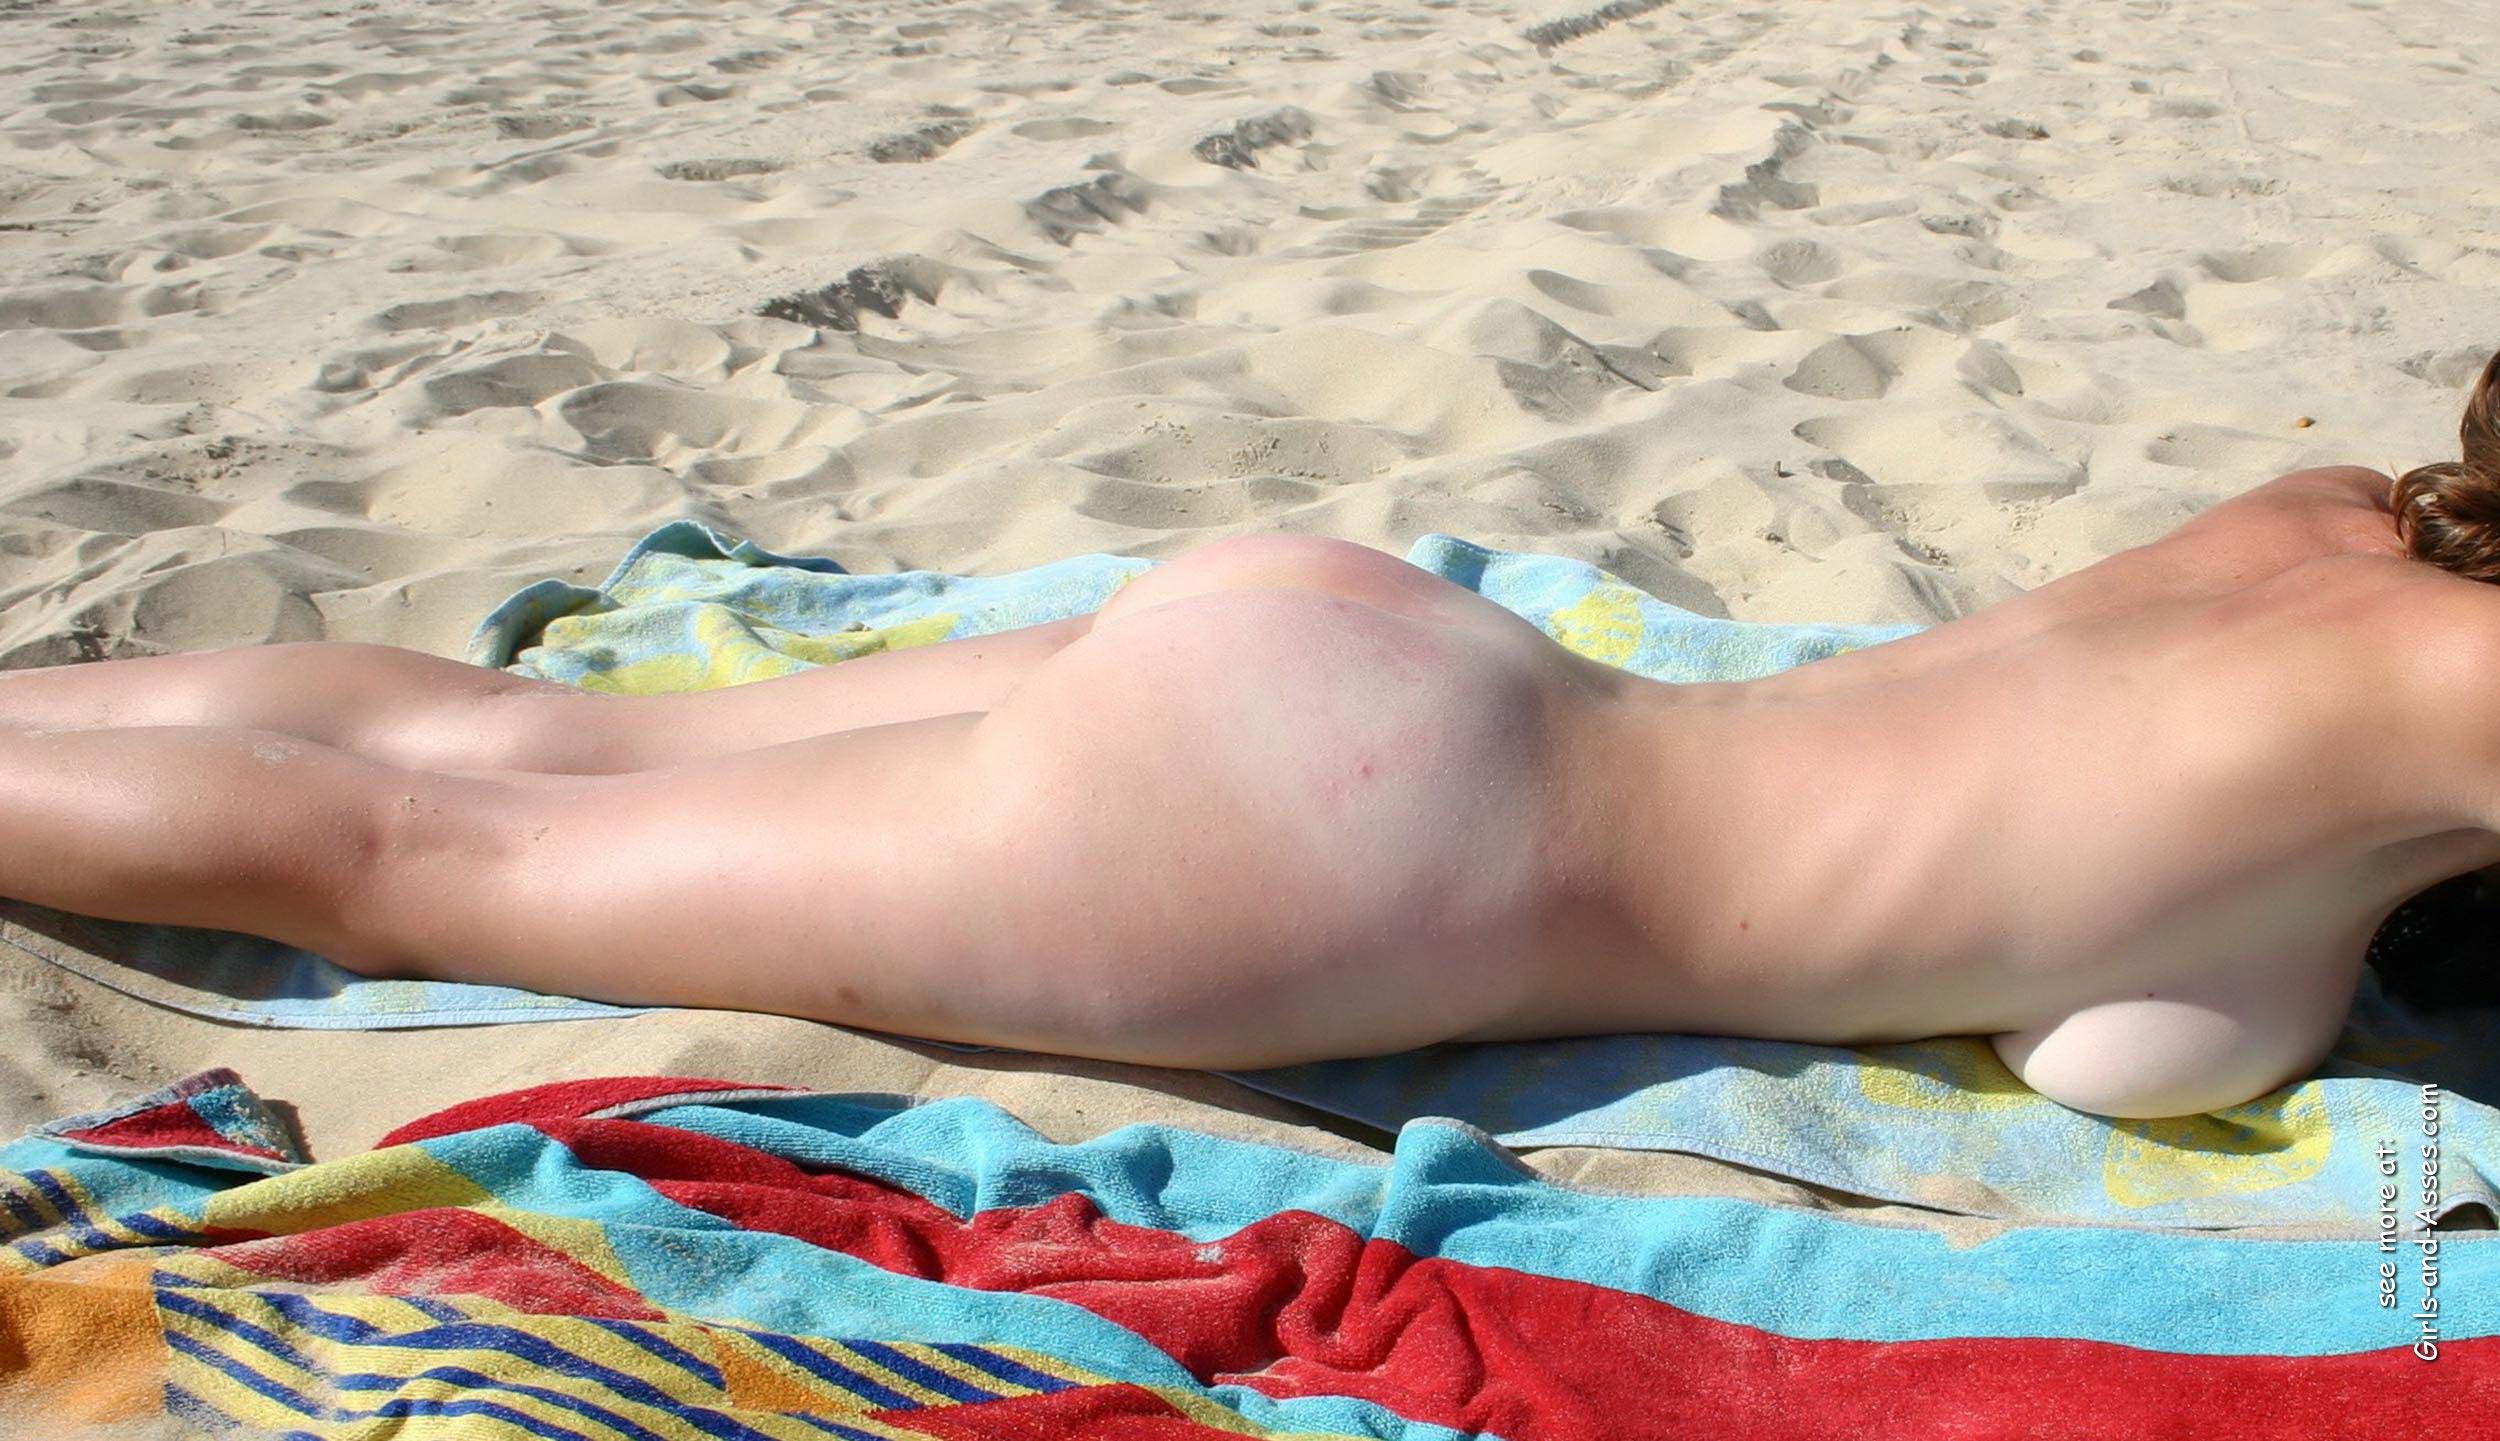 amatuer nude girl at the beach photography 01759